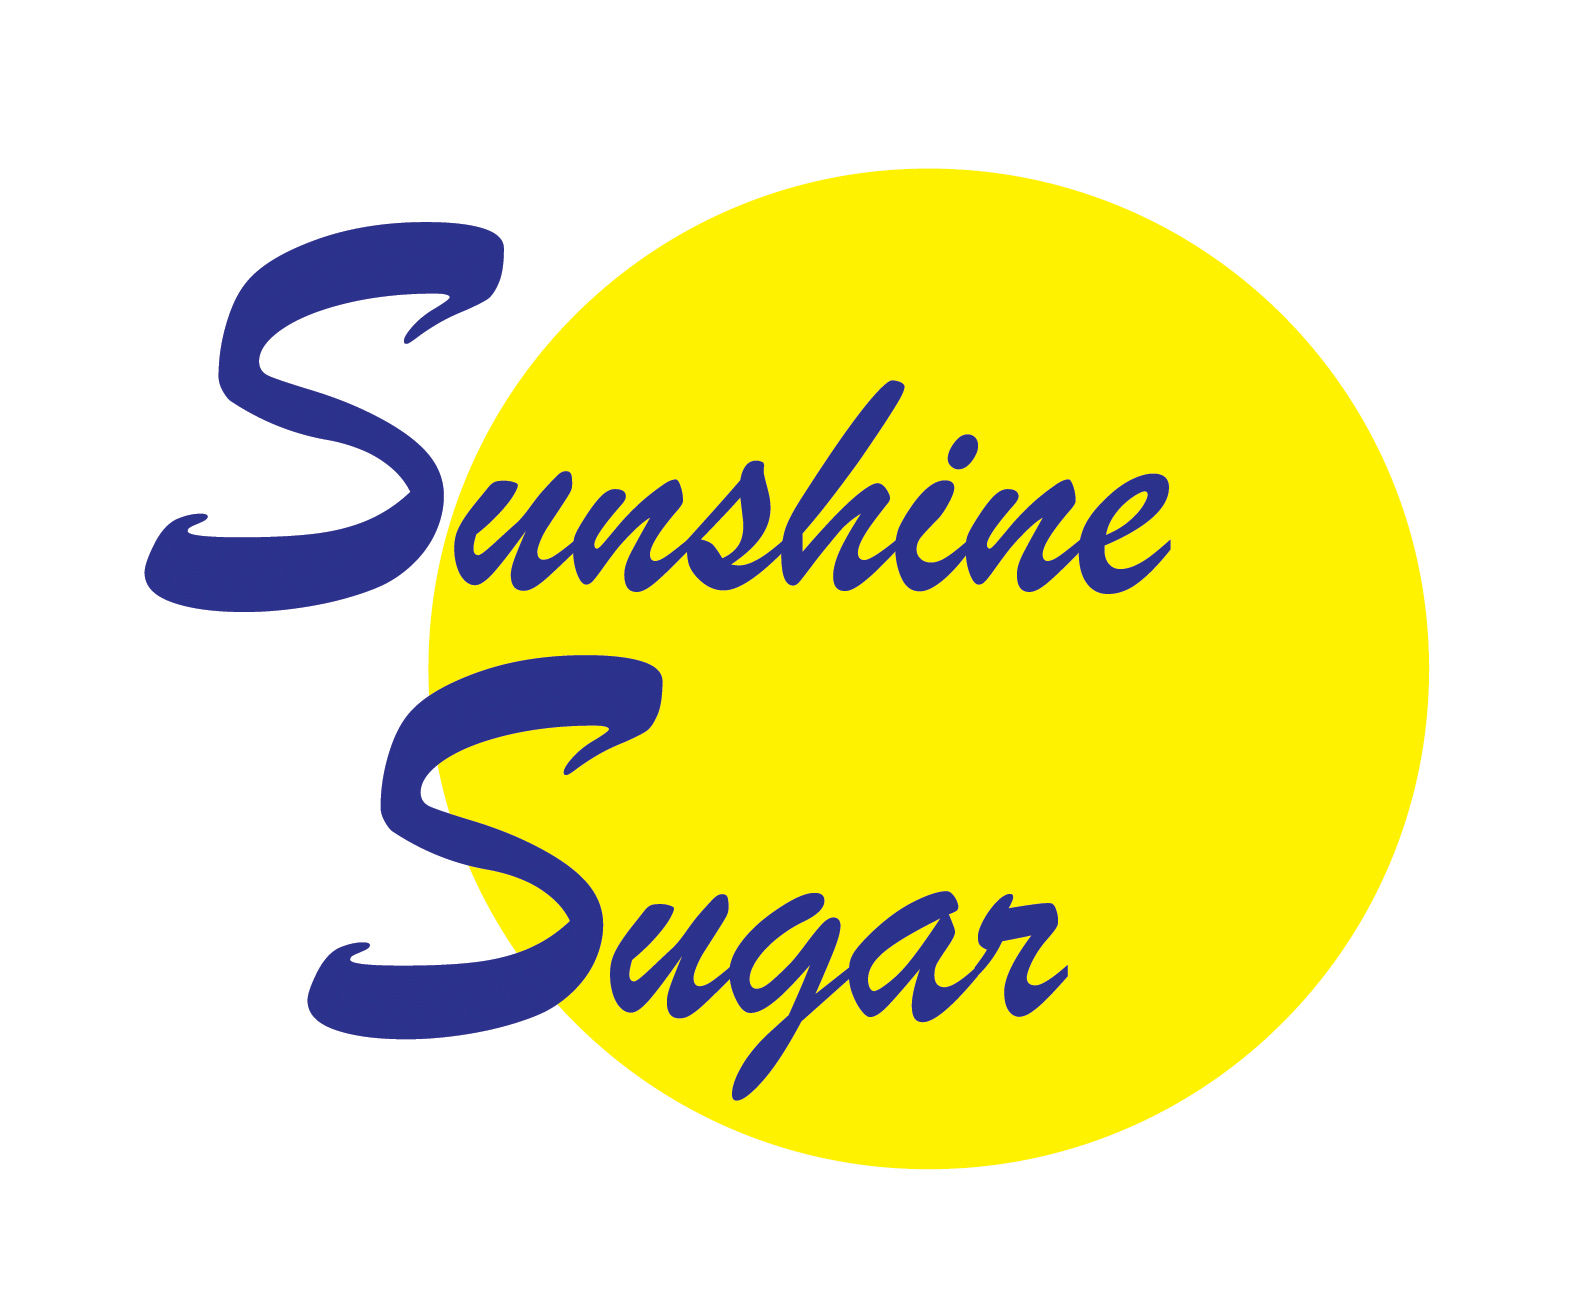 SS Colour Logo.jpg